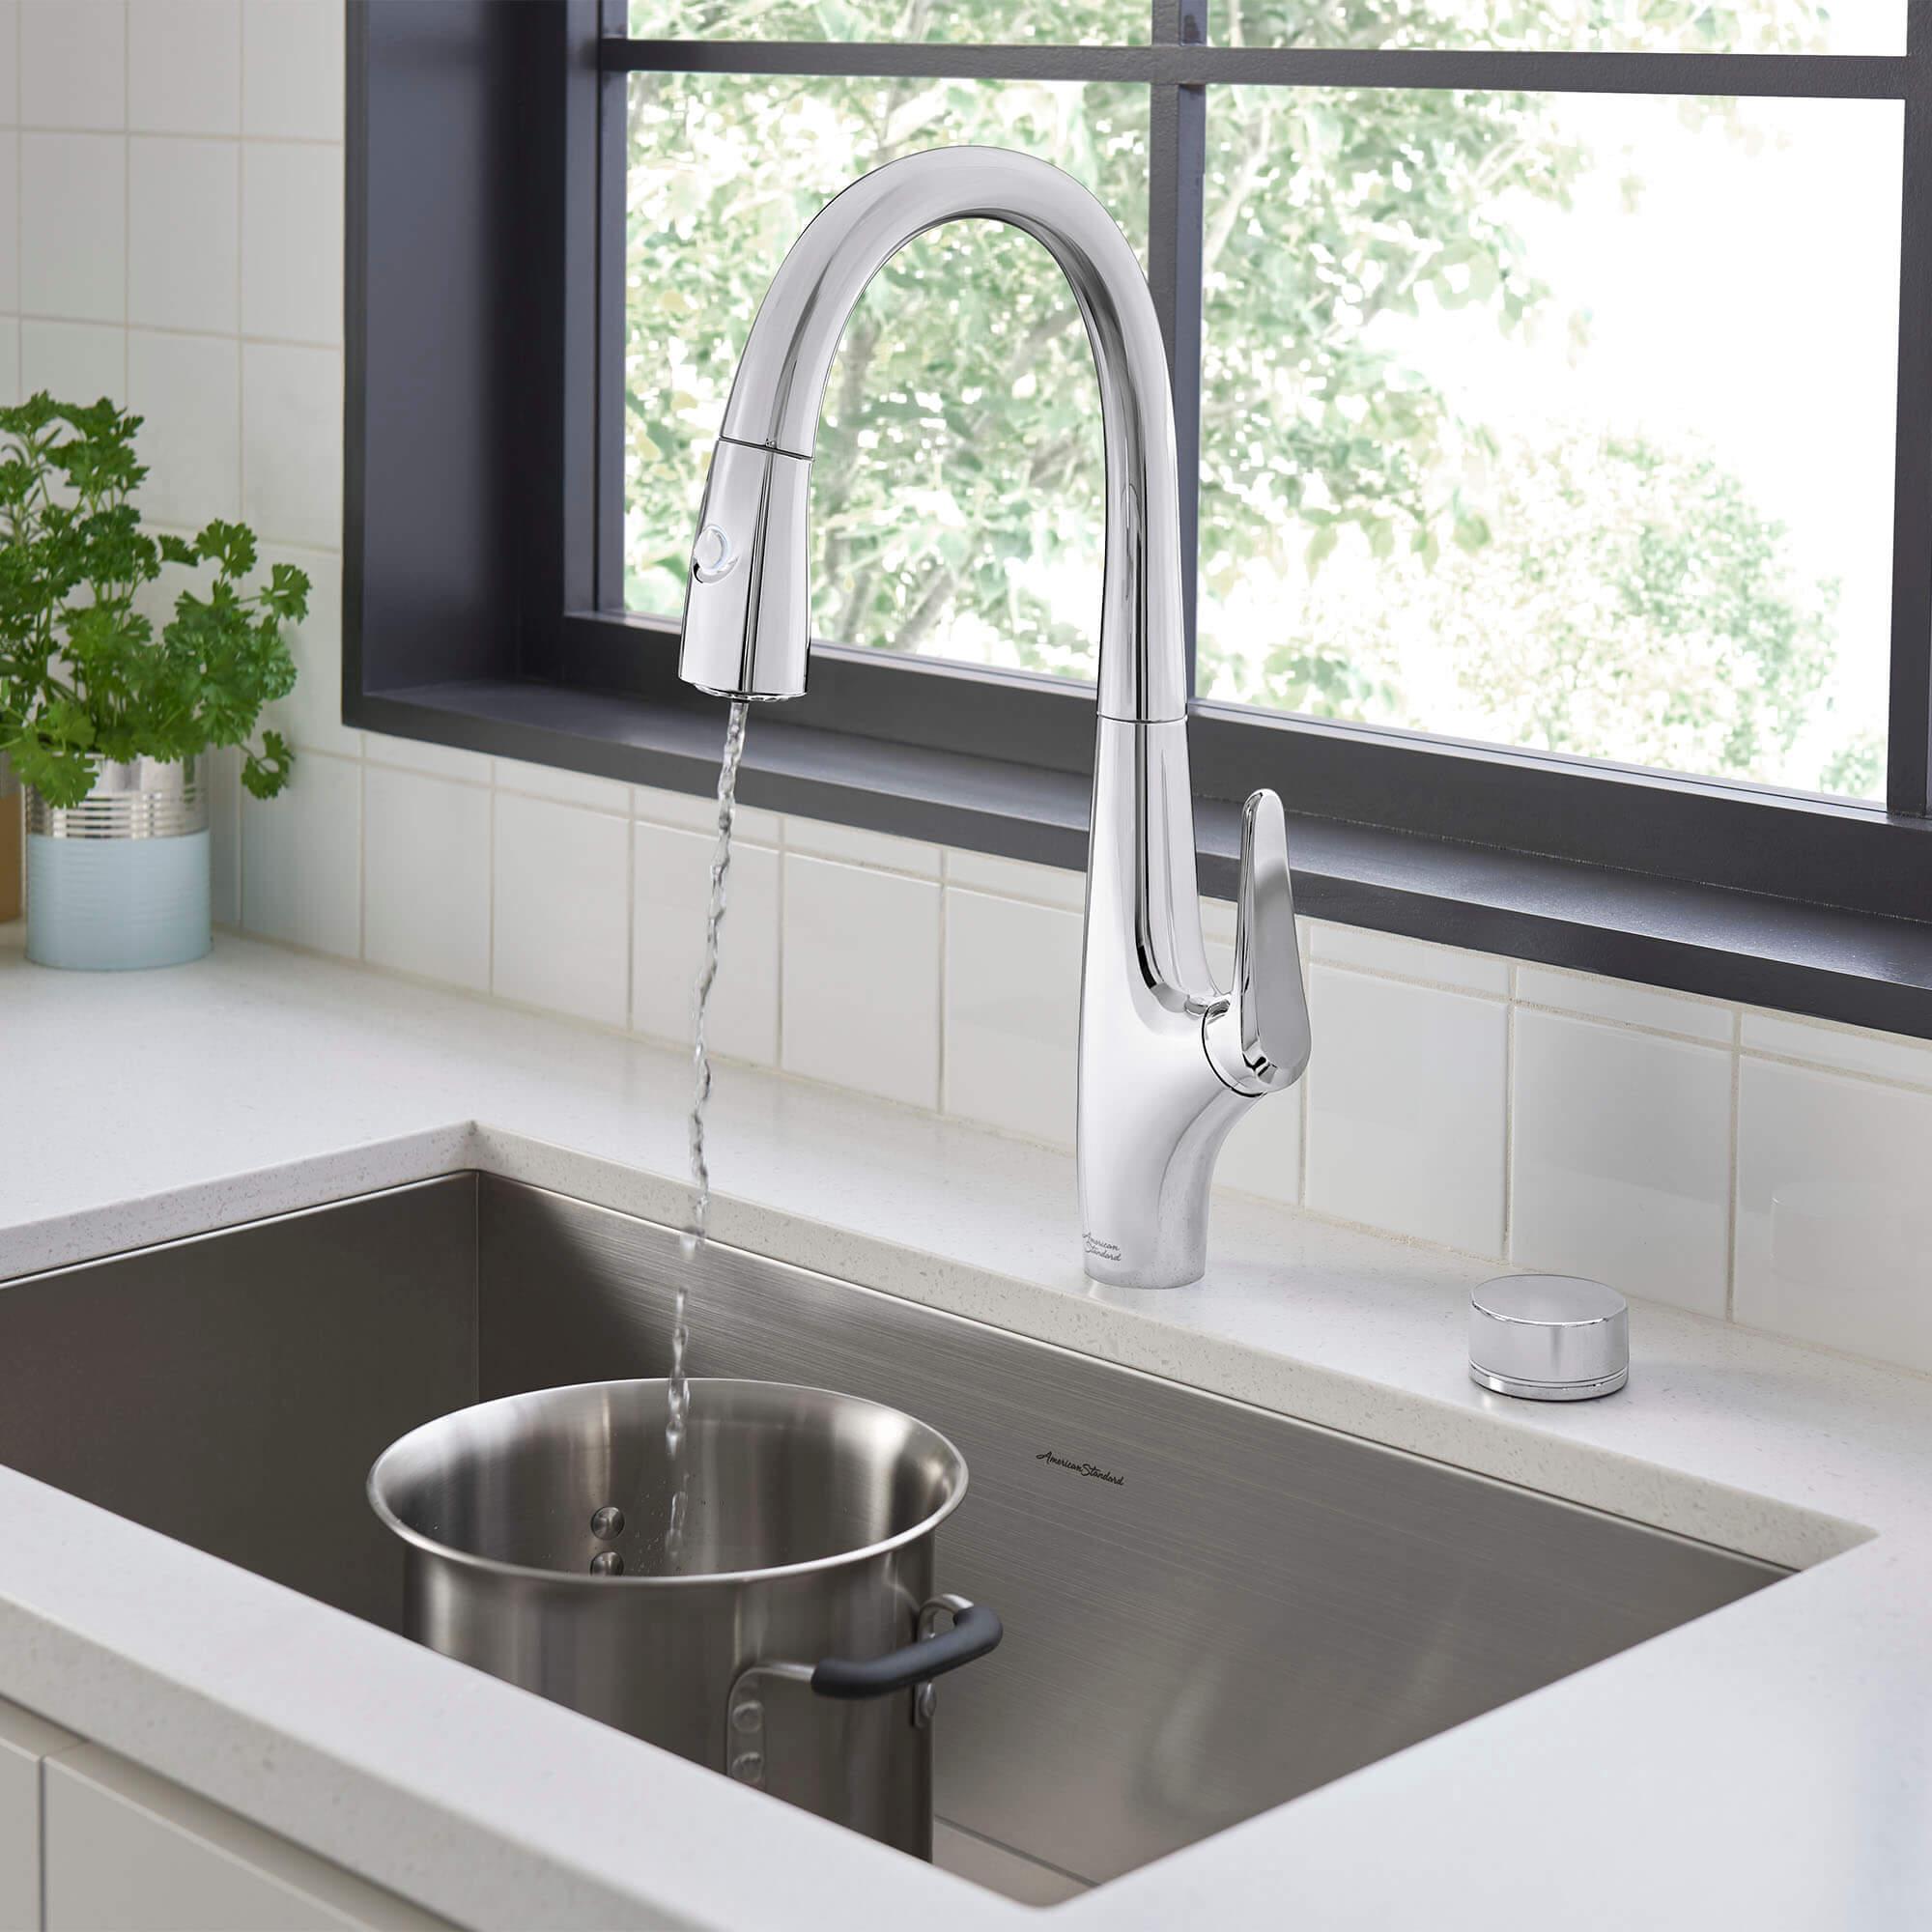 saybrook filtered kitchen faucet